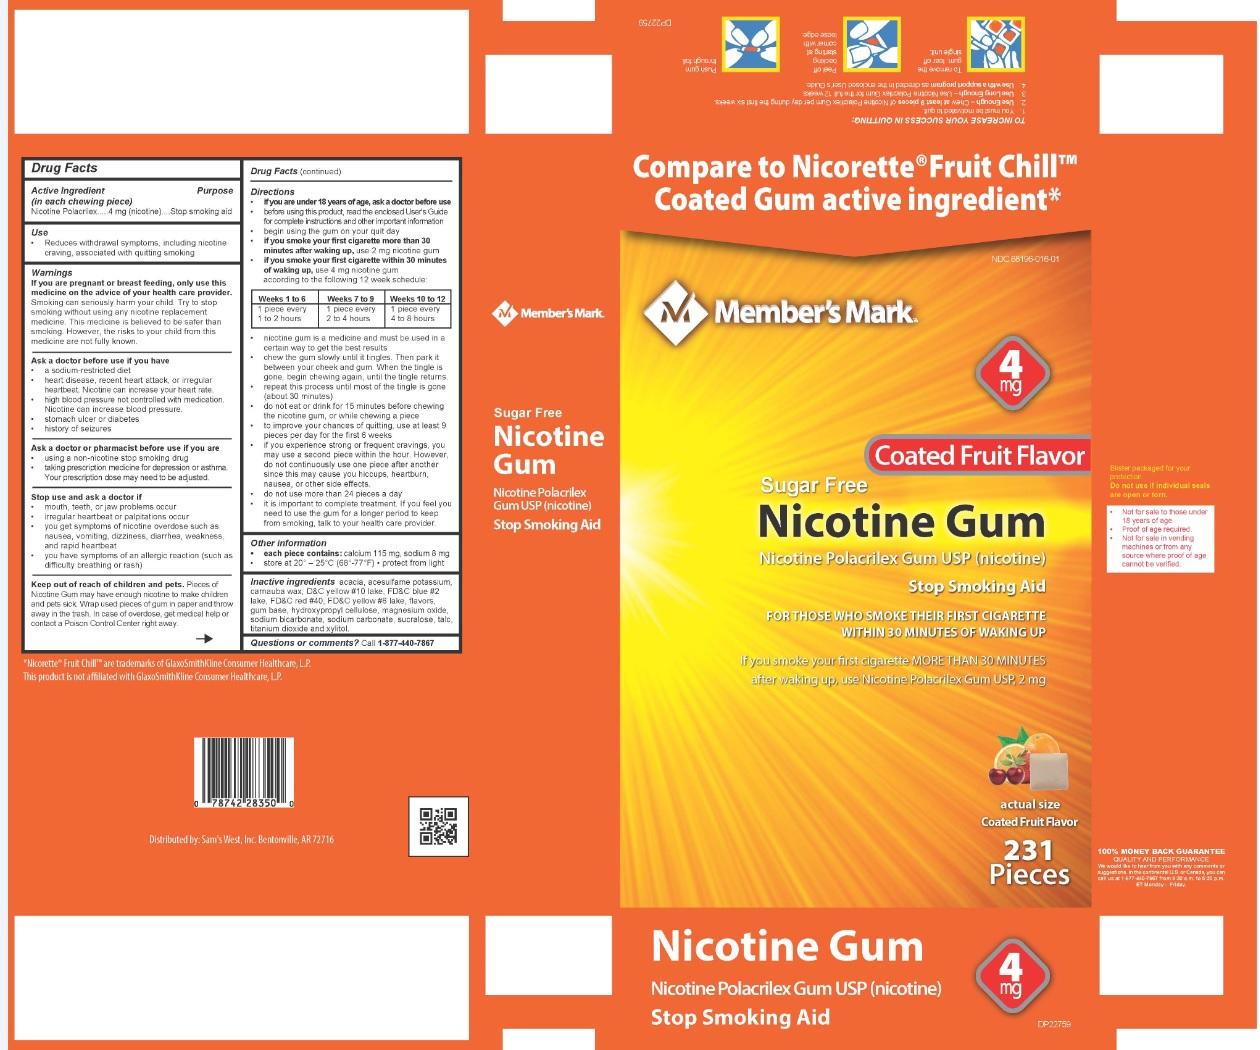 Nicotine Polacrilex Gum USP 4 mg Fruit Flavor